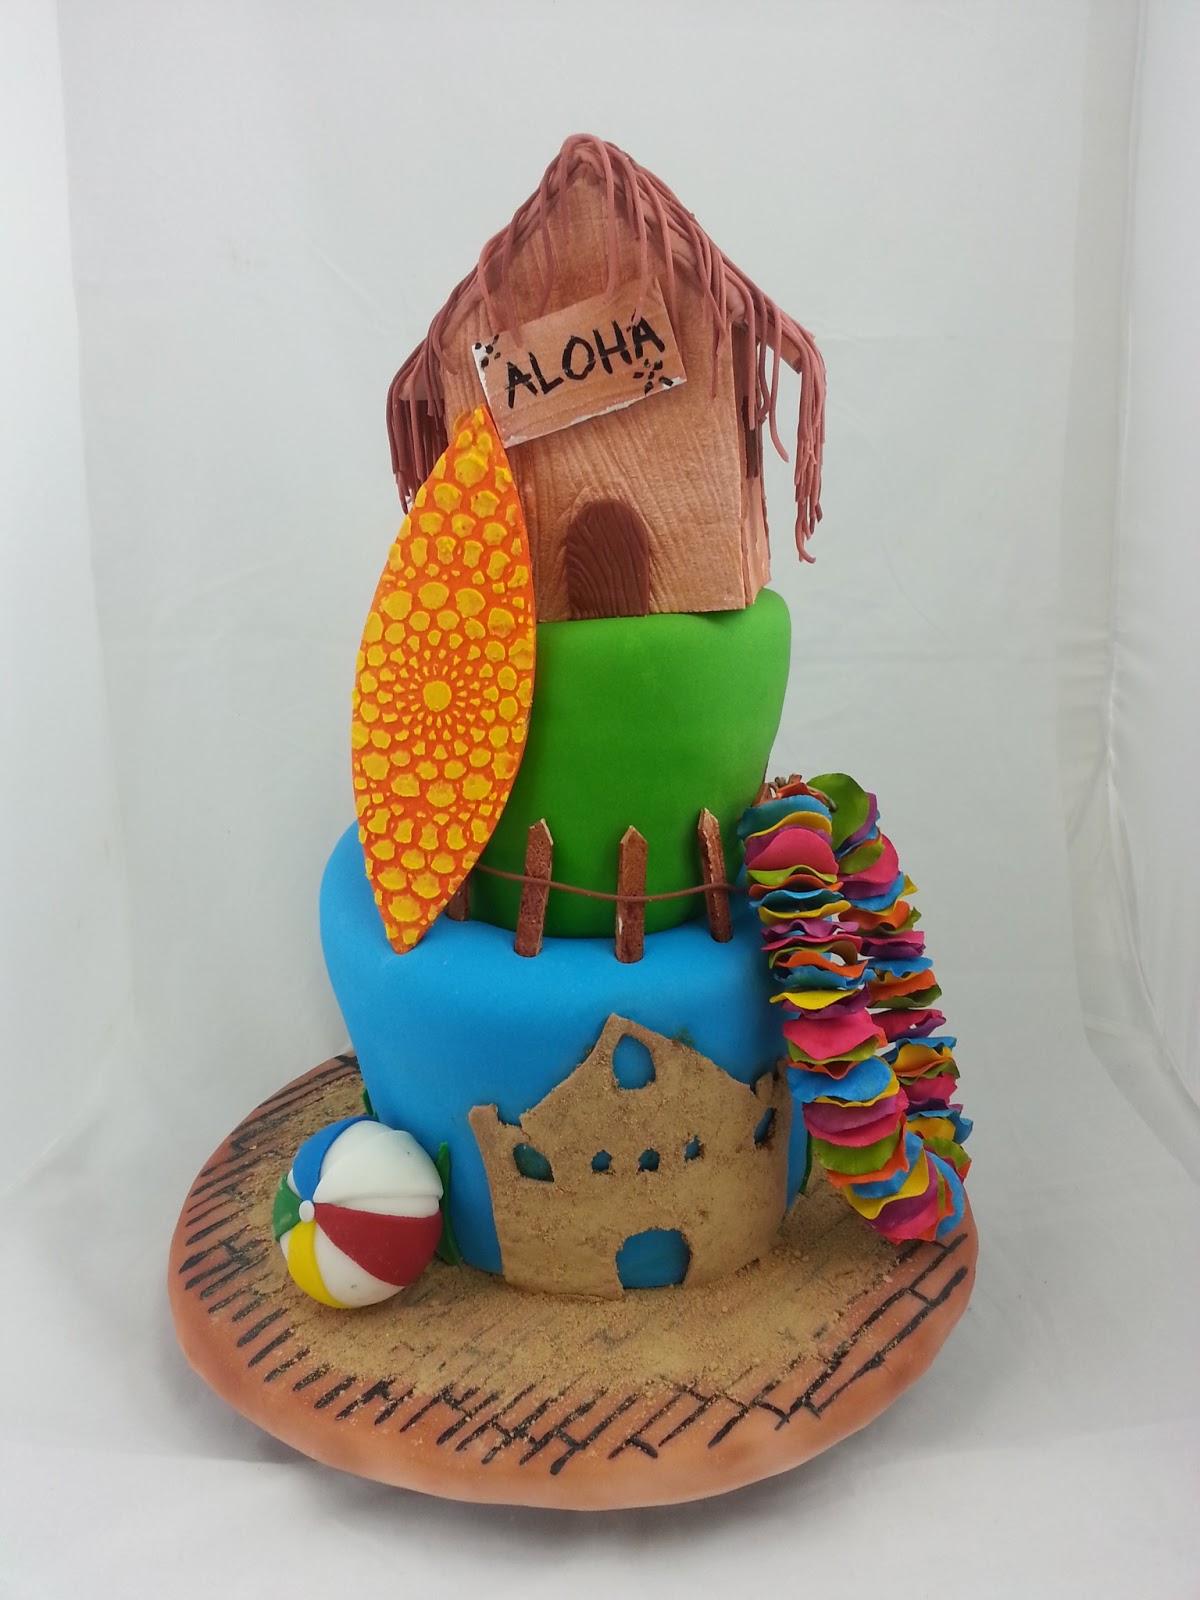 The Orange Apron Cakery: Custom Cakes